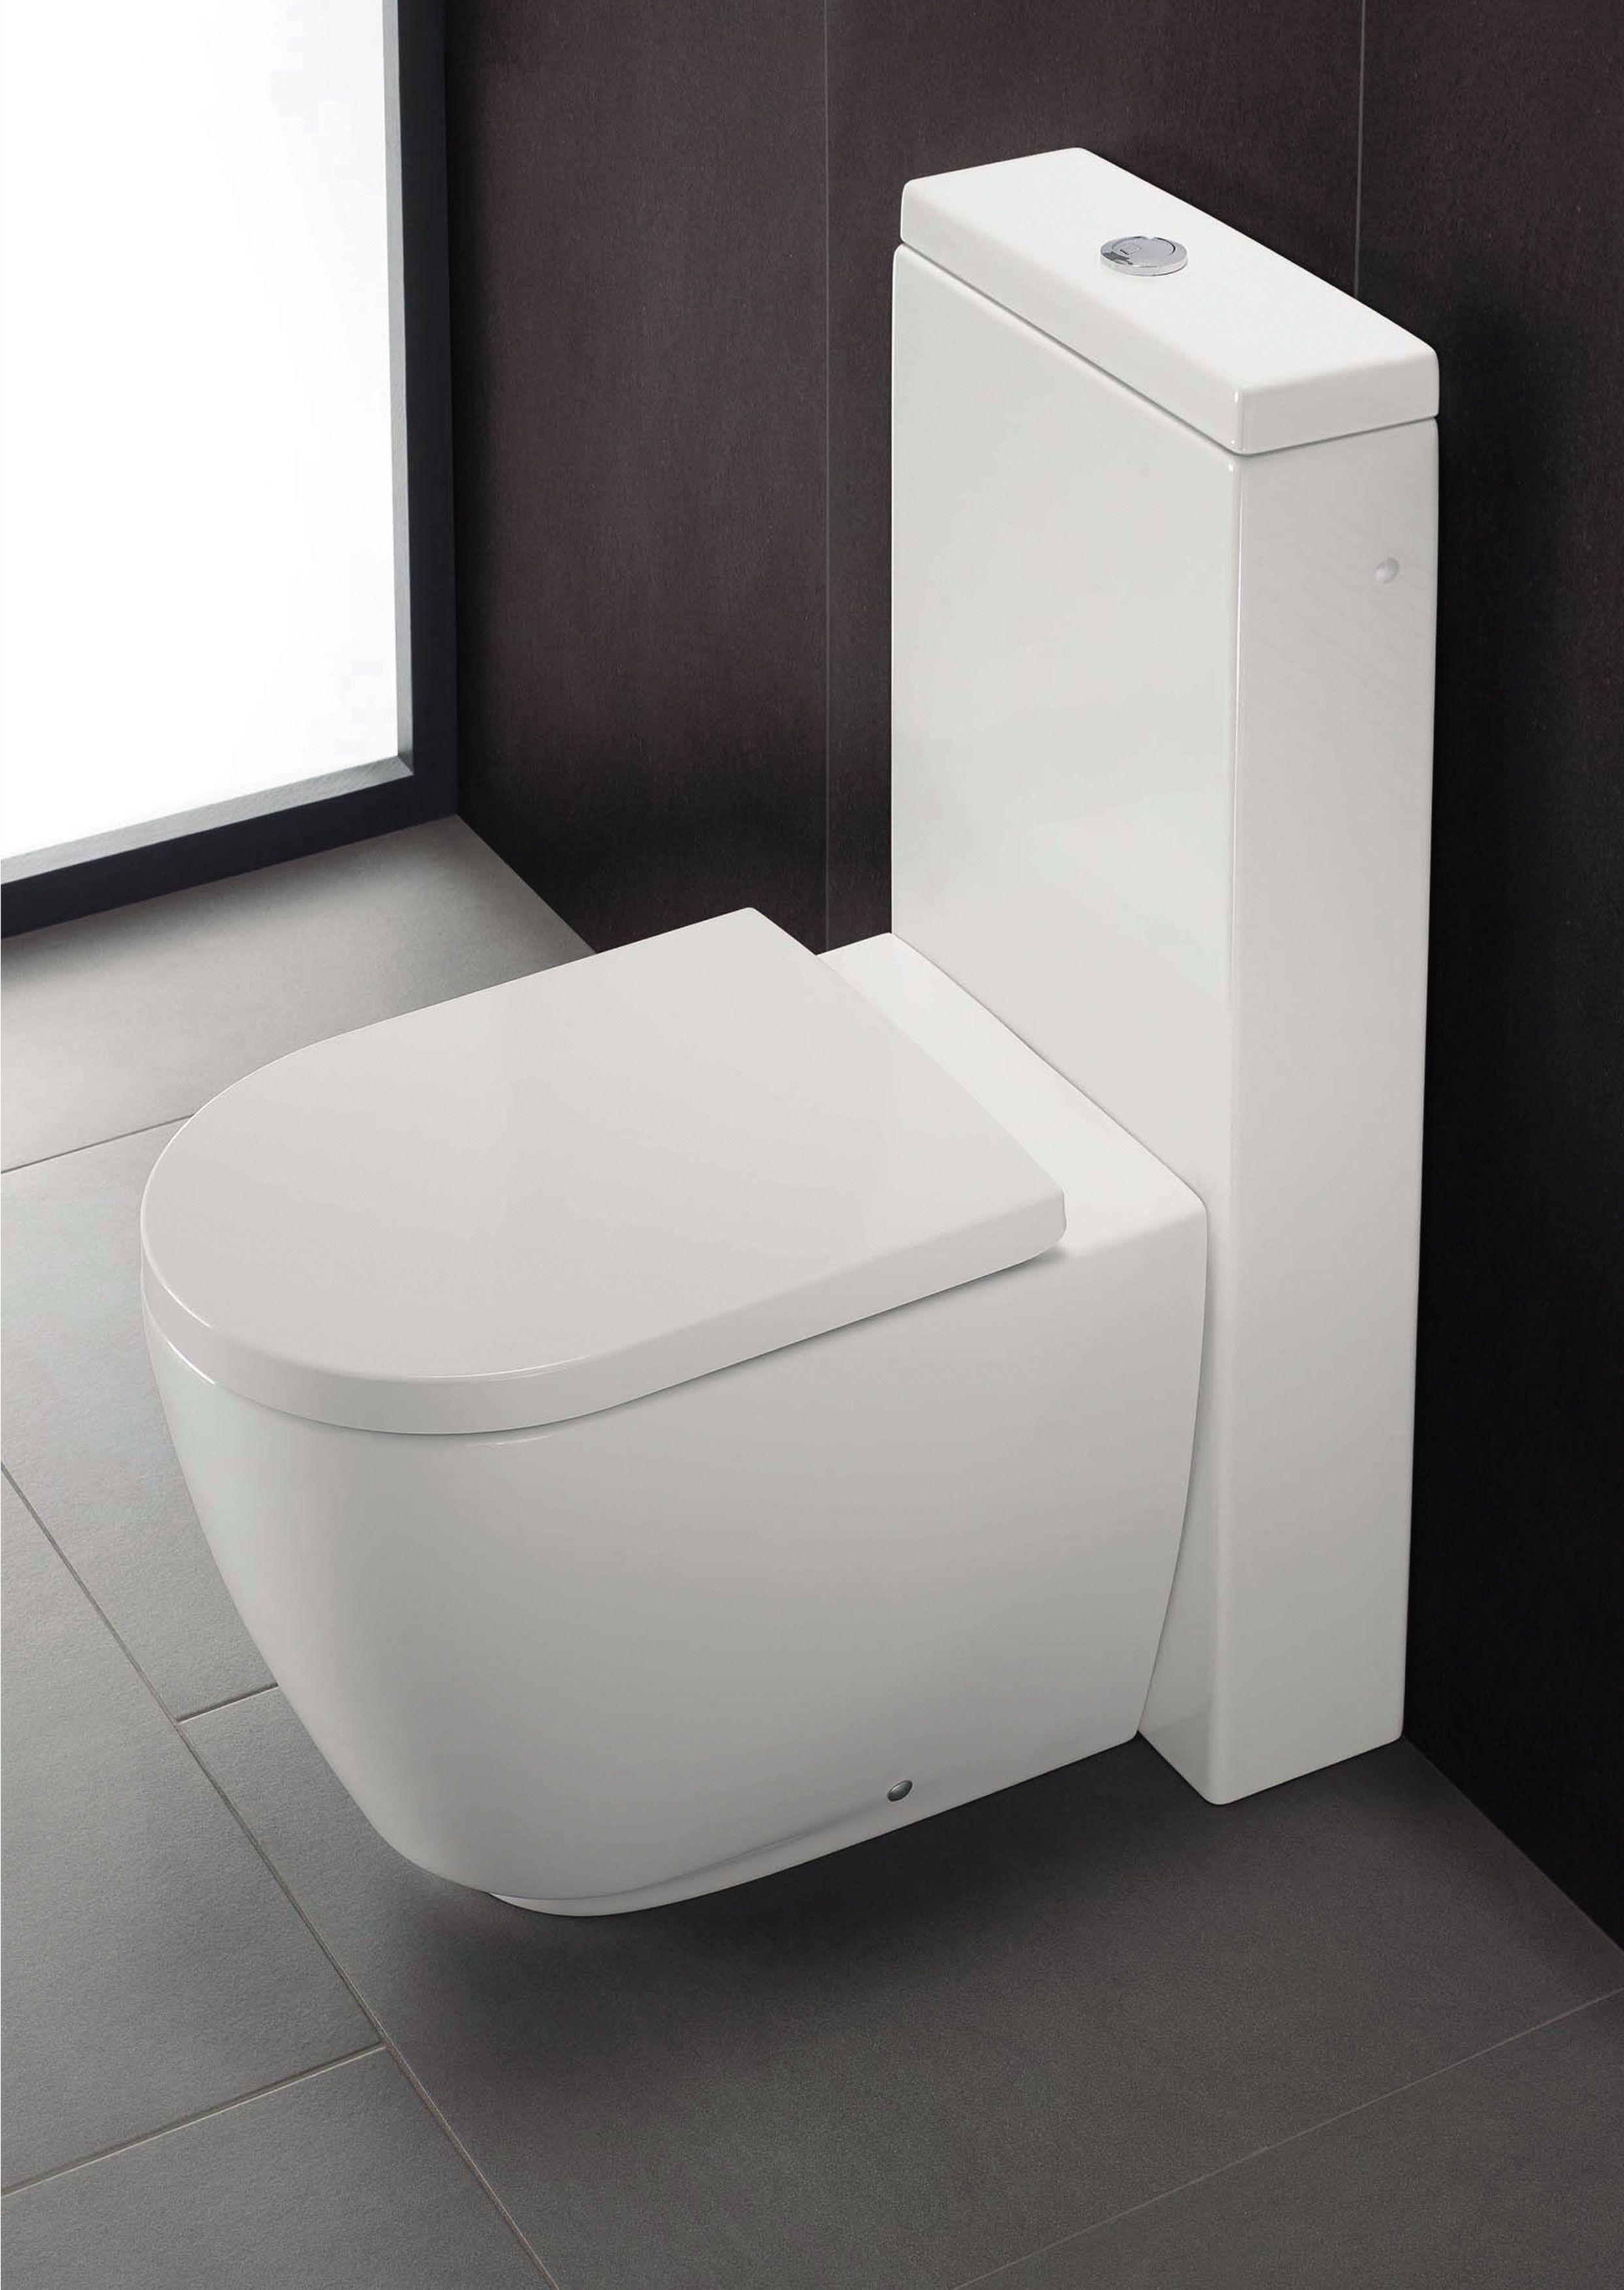 Hatria - Fusion Сантехника | Hatria | Pinterest Toilette Und Bidet Design Hatria